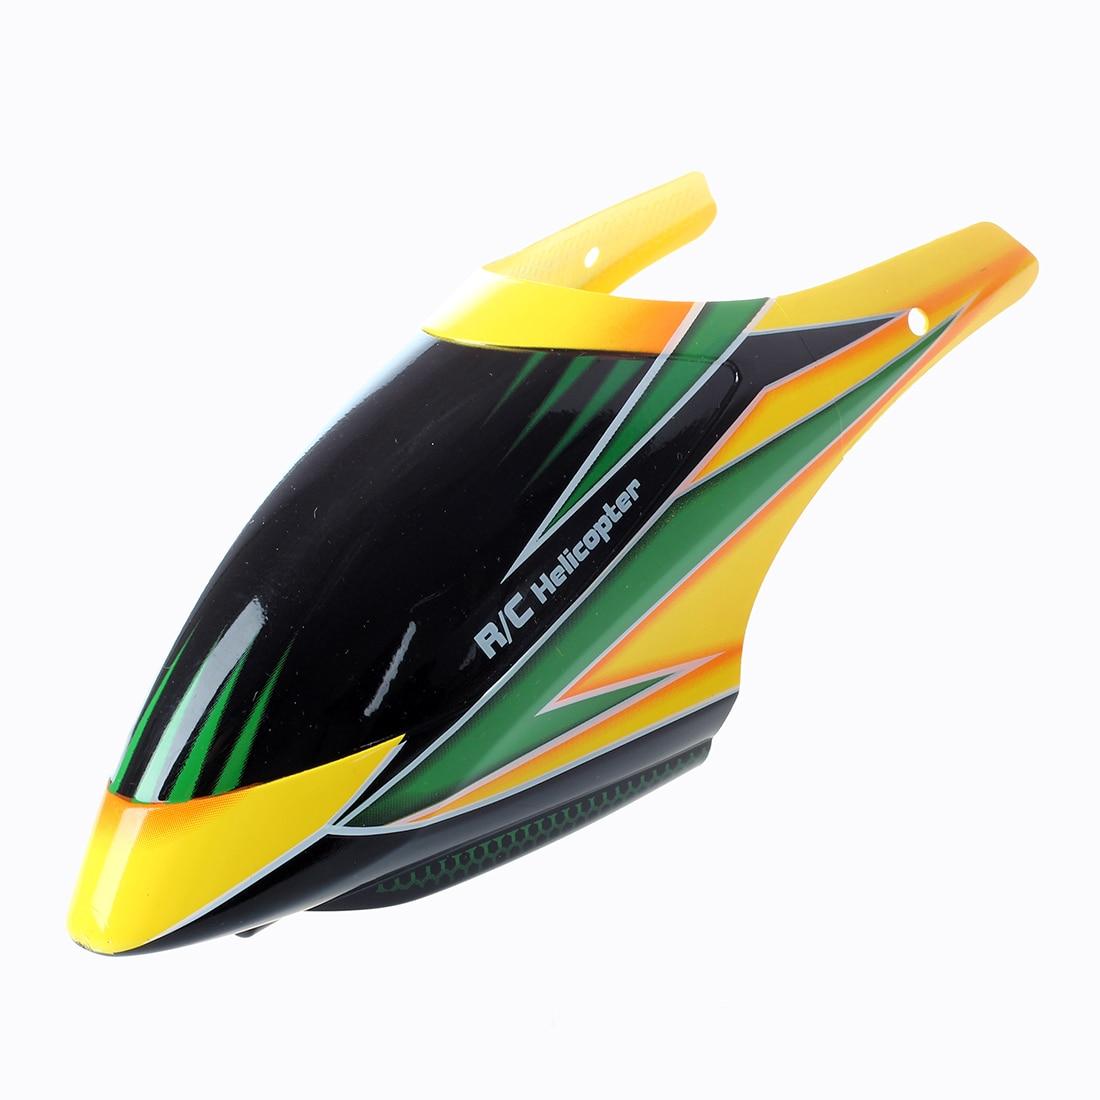 MACH Jaune, vert, noir maximisée V912-23 tête shell